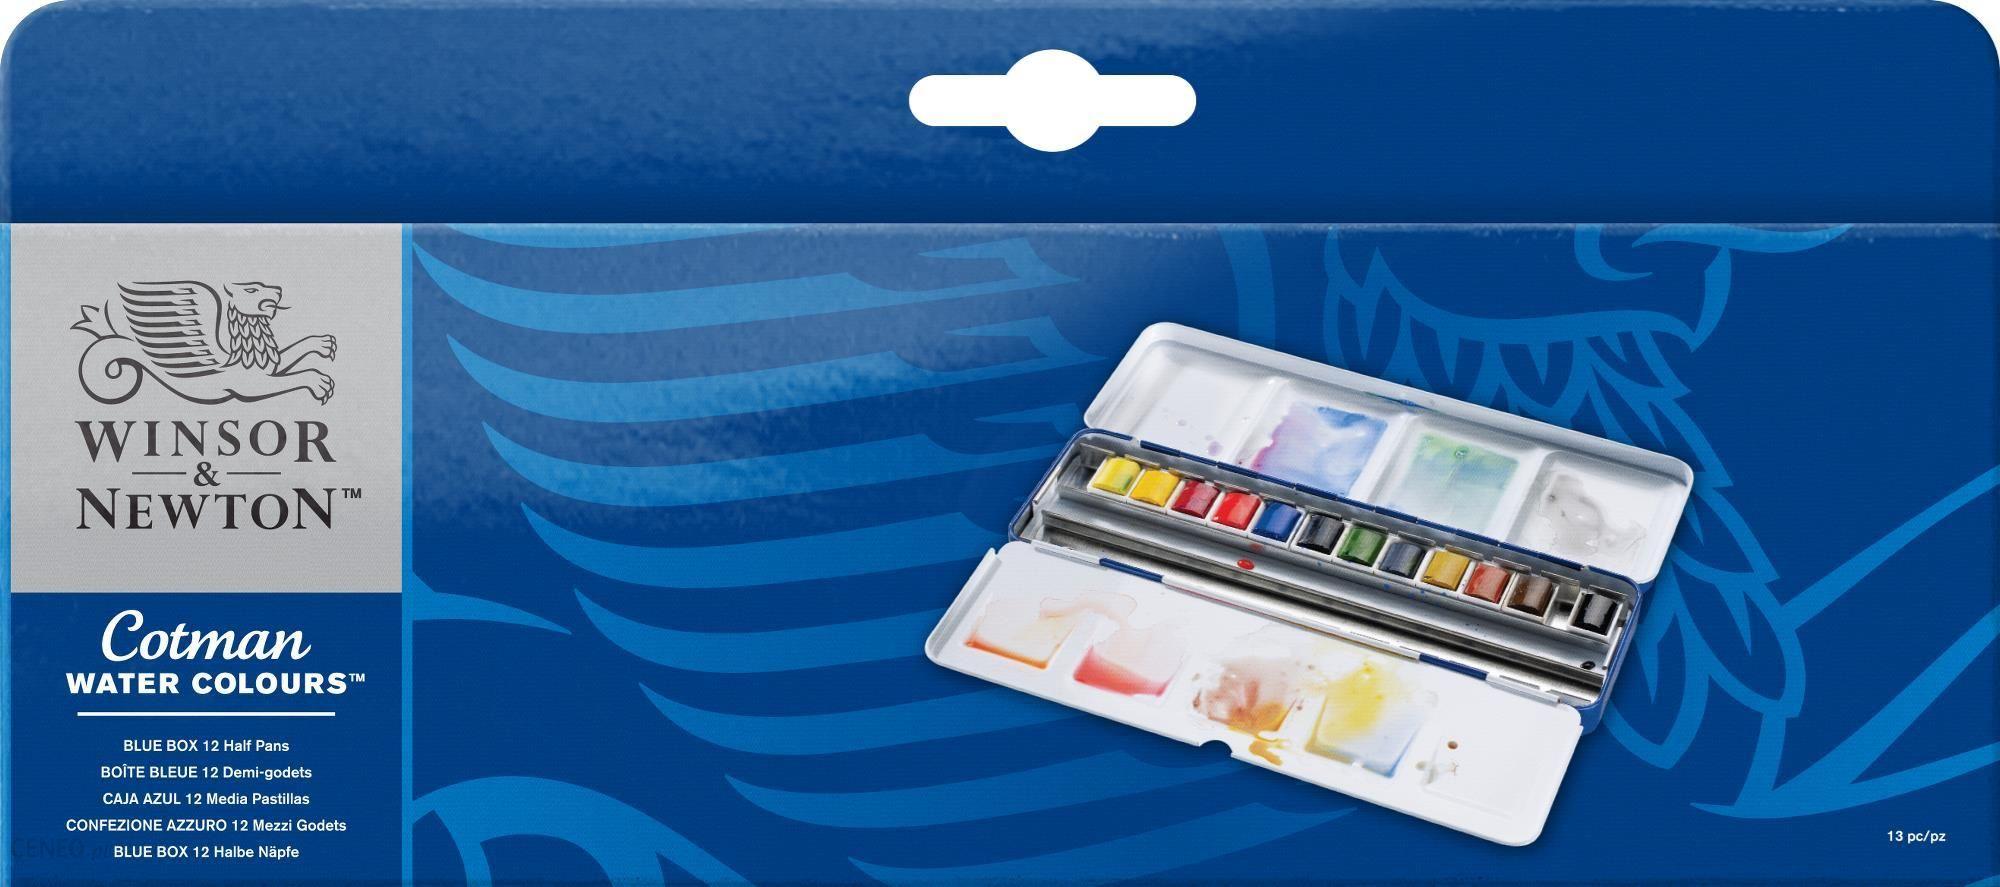 W&N Cotman BLUE BOX 12 półkostek/24 - zestaw farb akwarelowych